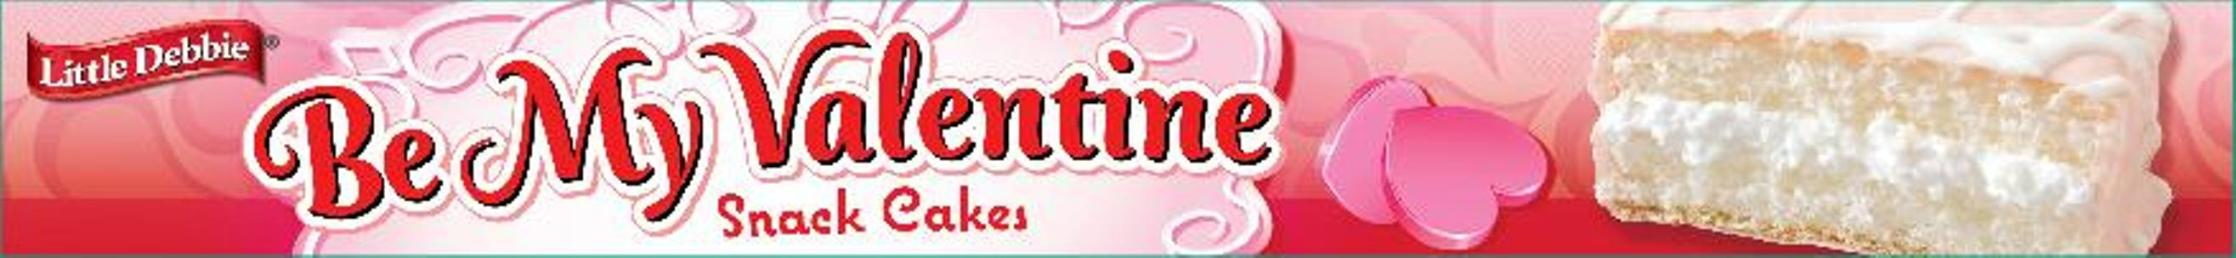 Little Debbie Snacks Be My Valentine Creme Filled White Snack ...